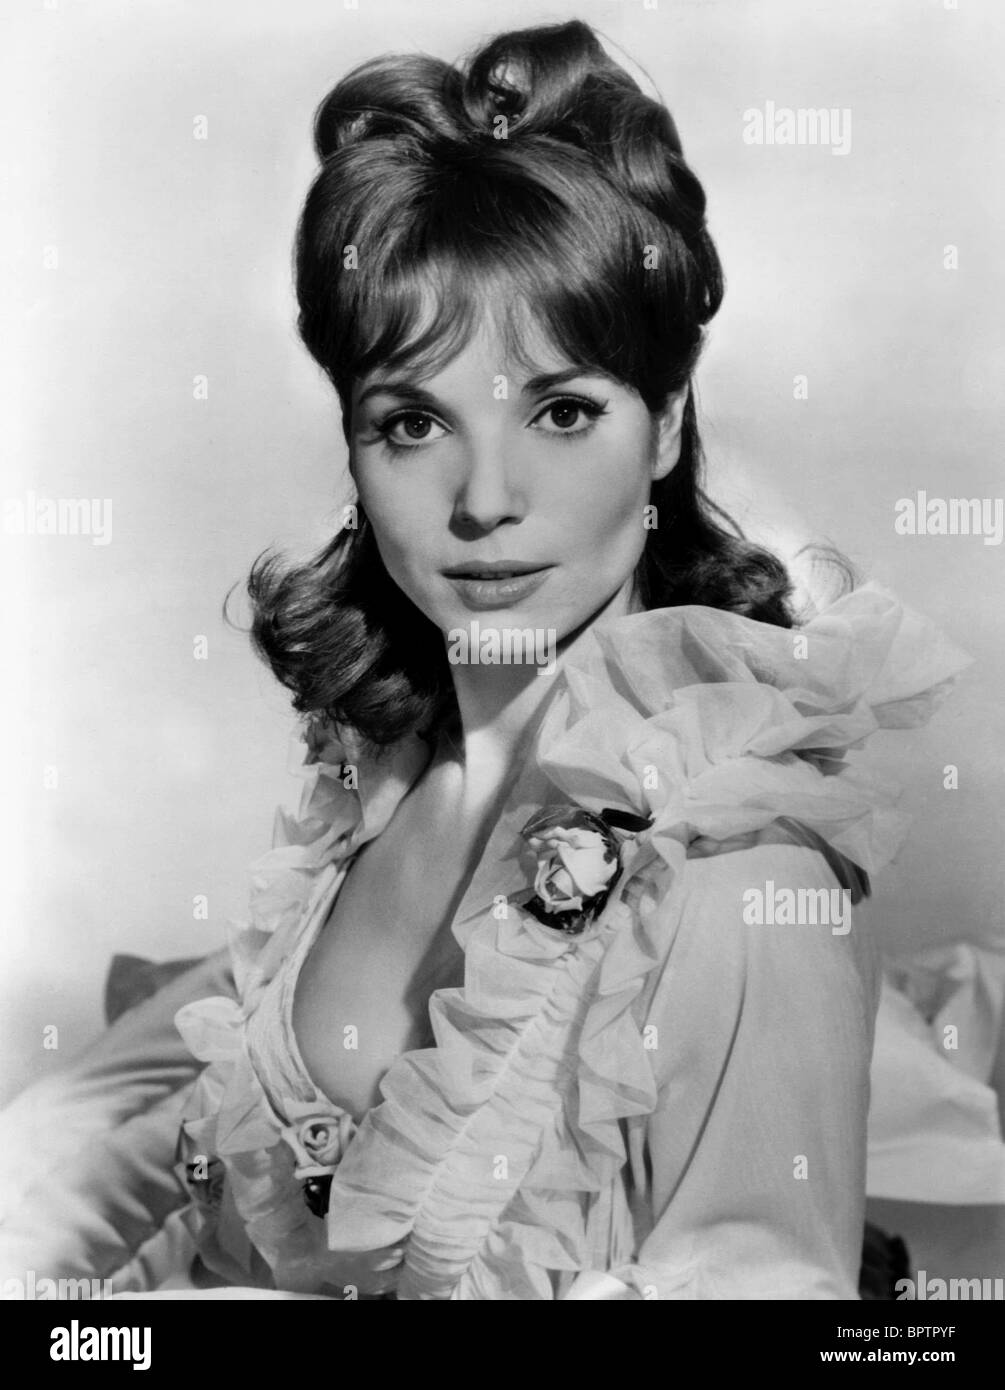 ELSA MARTINELLI ACTRESS (1963) - Stock Image